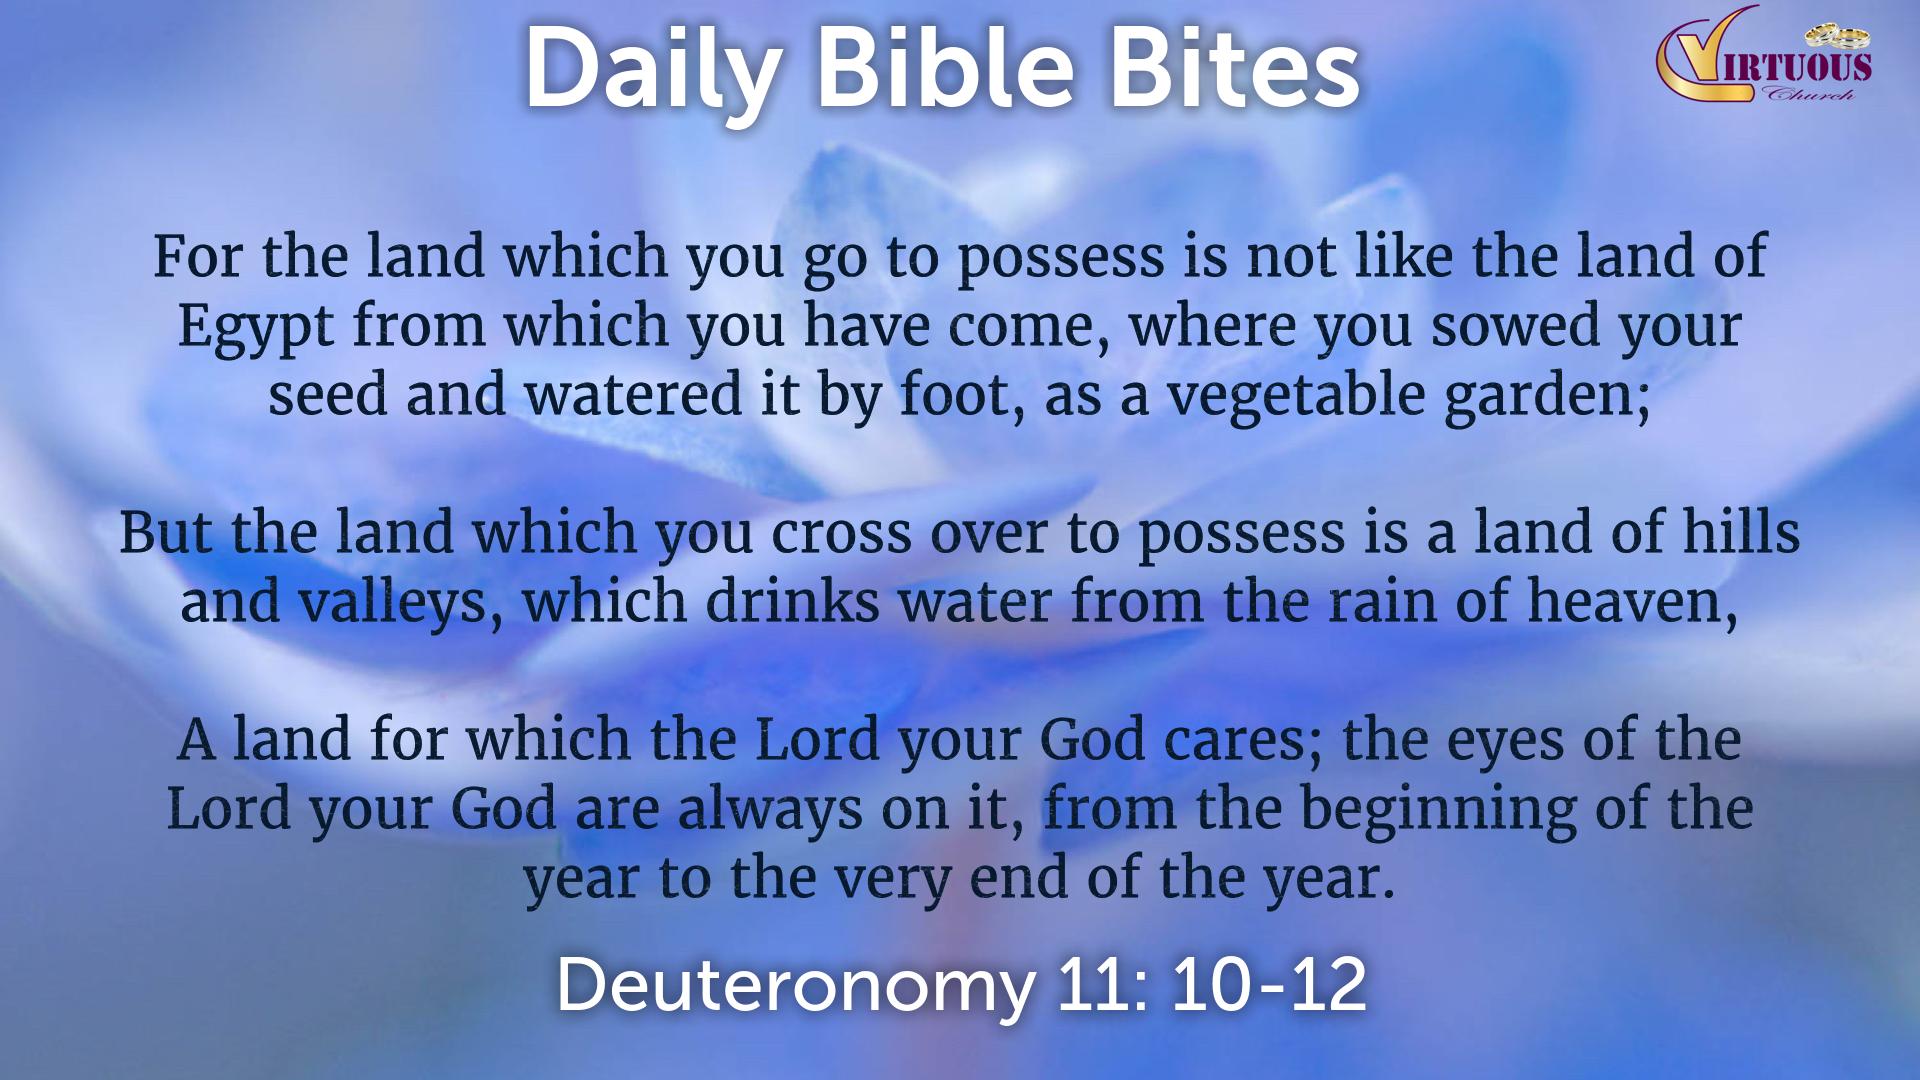 Daily Bible Bites 2